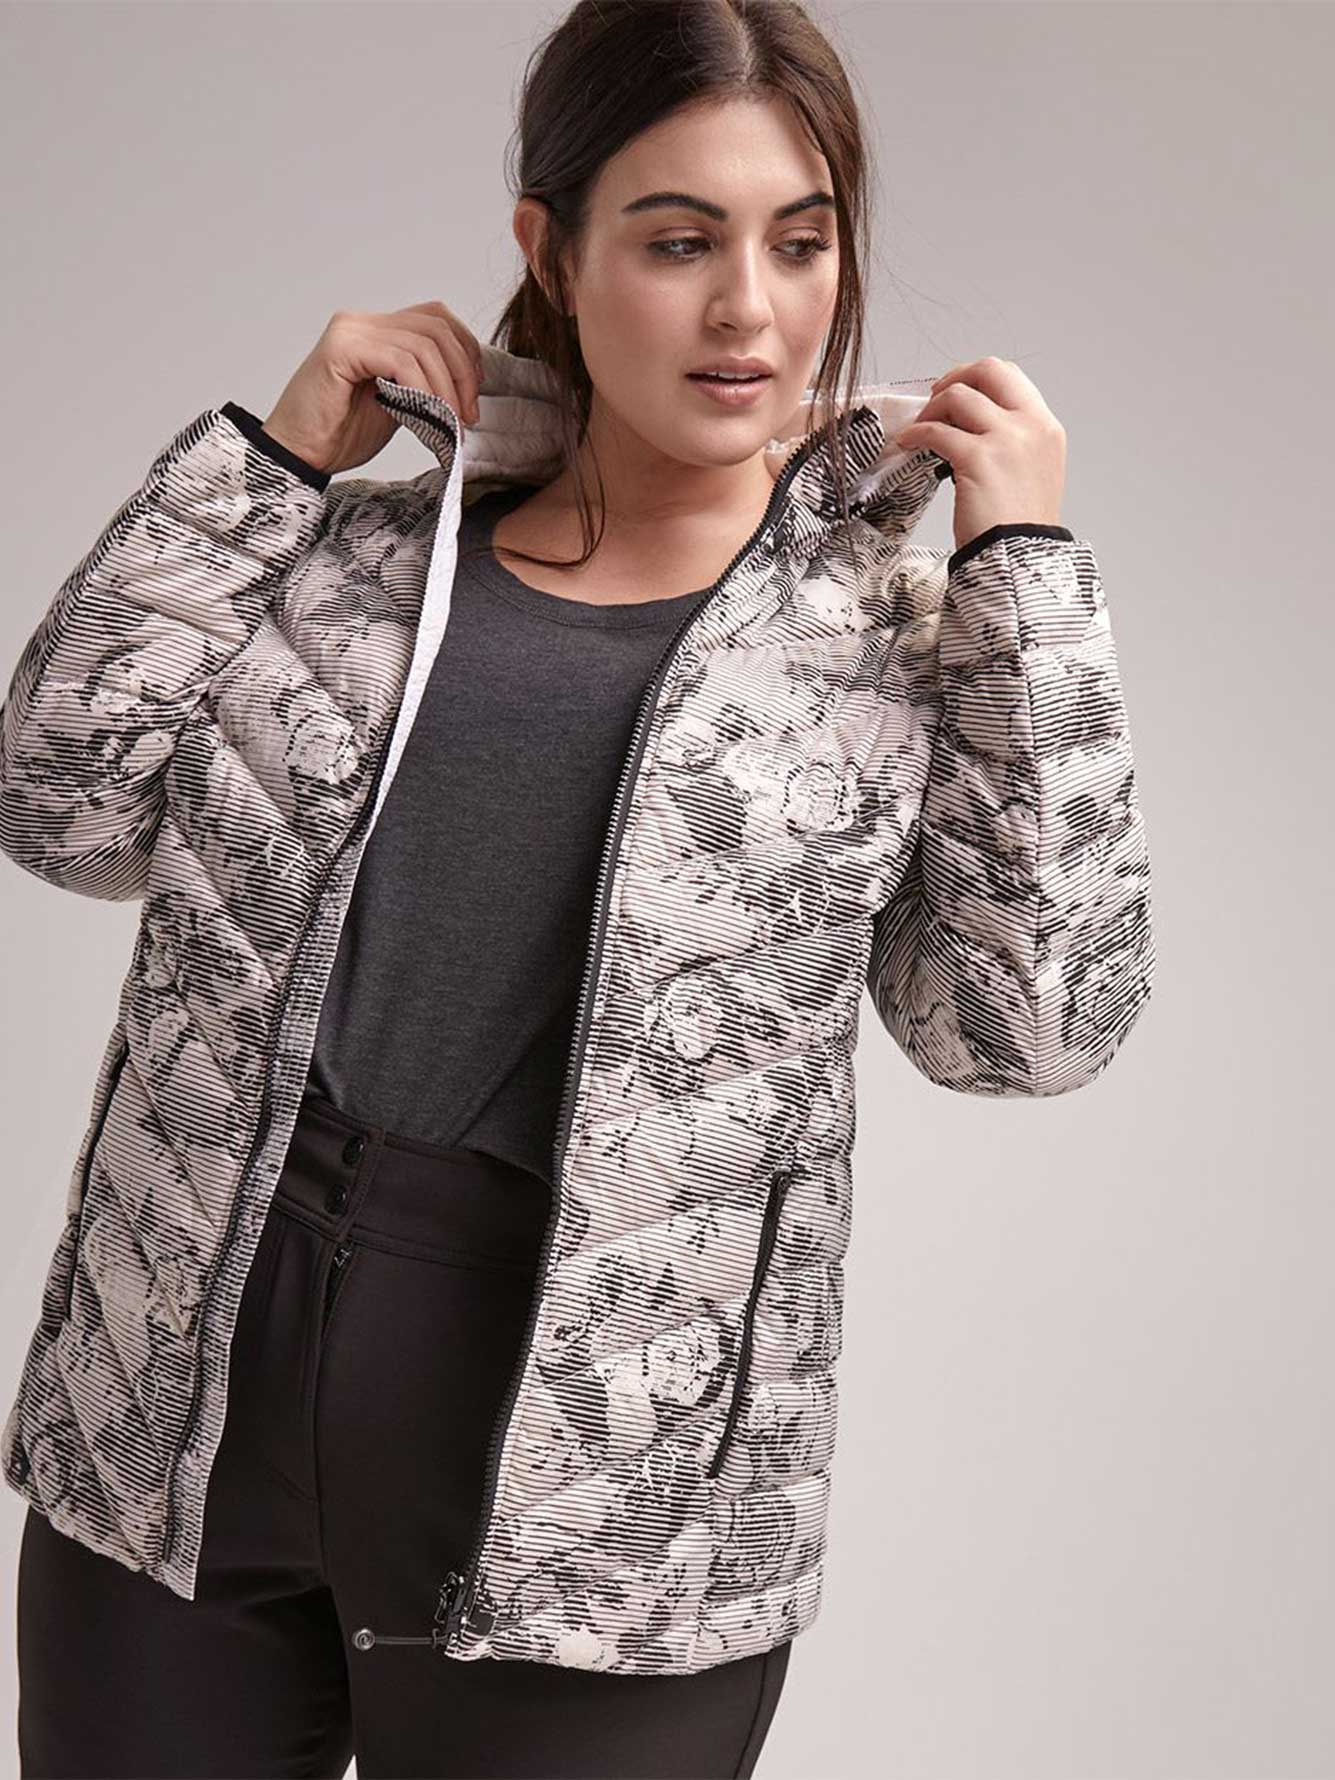 464251b21d6540 Plus Size Printed Packable Jacket with Hood - ActiveZone | Penningtons